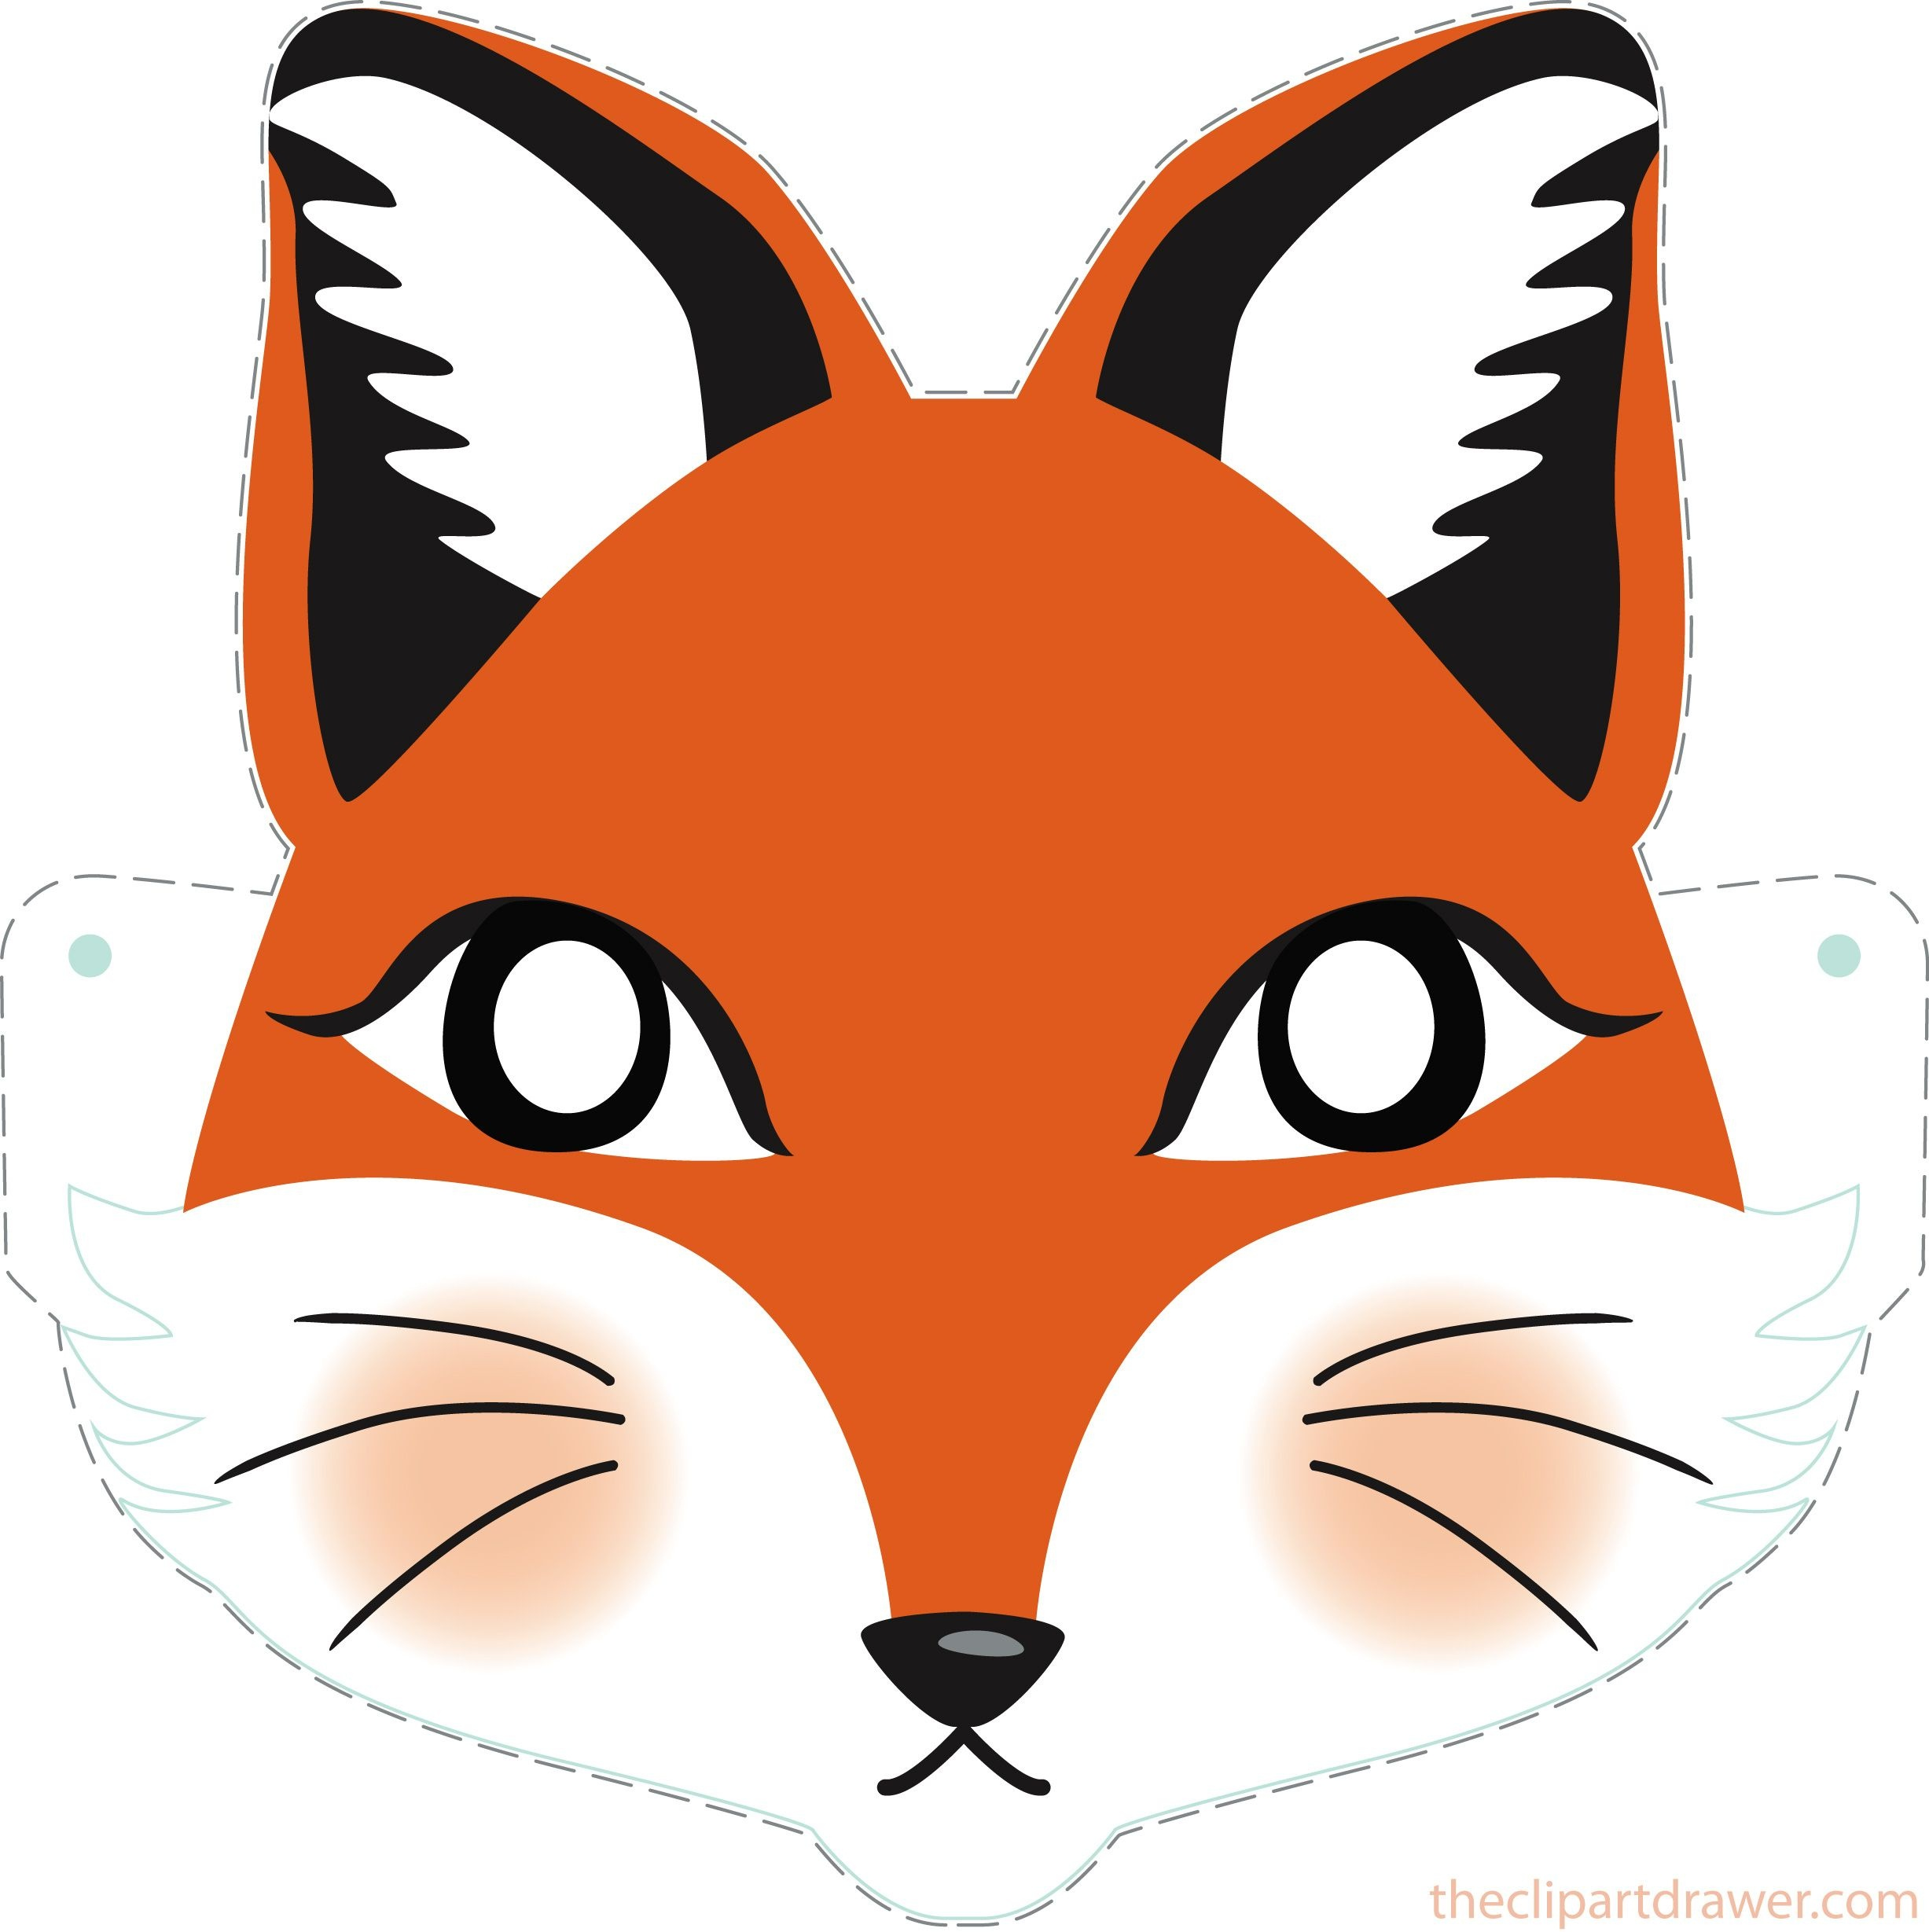 Diy Fox Printable Mask For Kids - Clipart Drawer | Diy | Printable - Free Printable Fox Mask Template